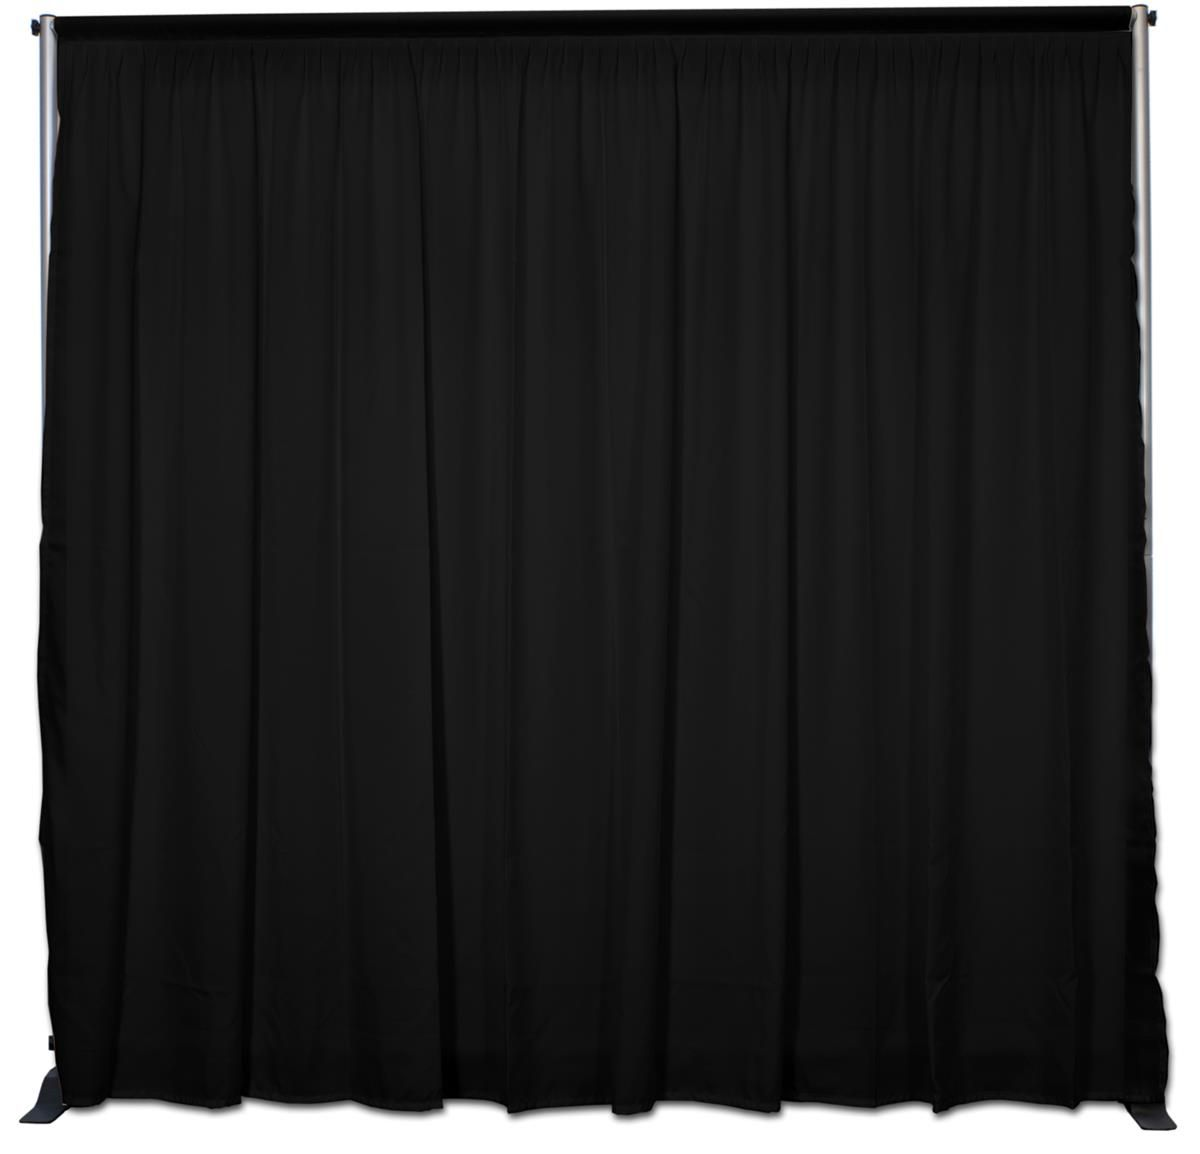 Black theatre curtain - 10 1 5 W Pipe And Drape Trade Show Backdrop Back Wall Black